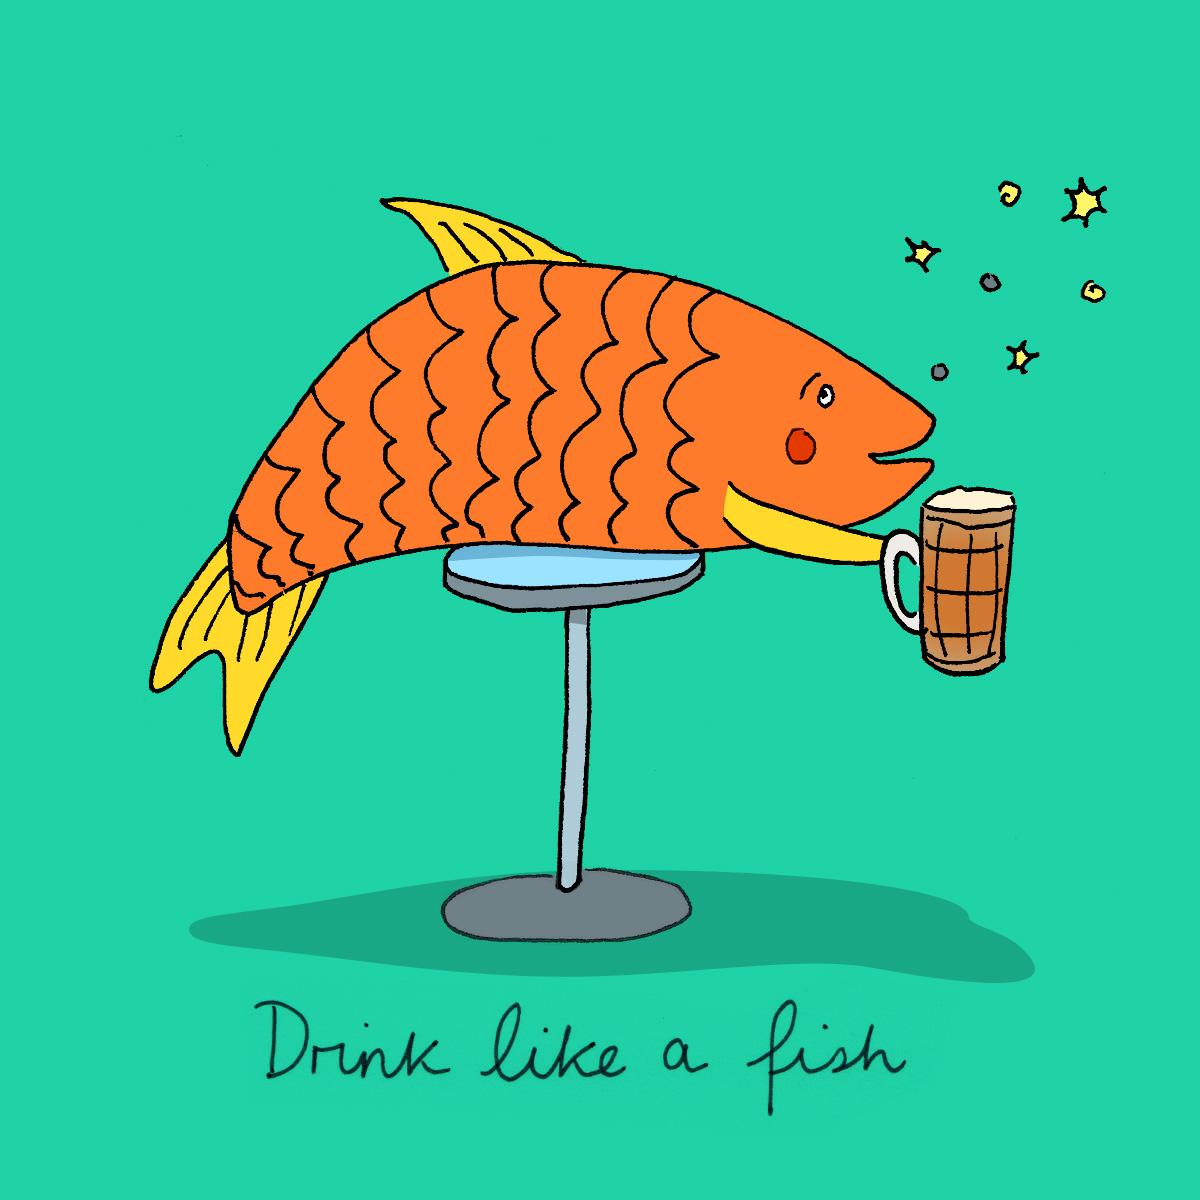 Phrases_illustrations_Drinkfish.jpg